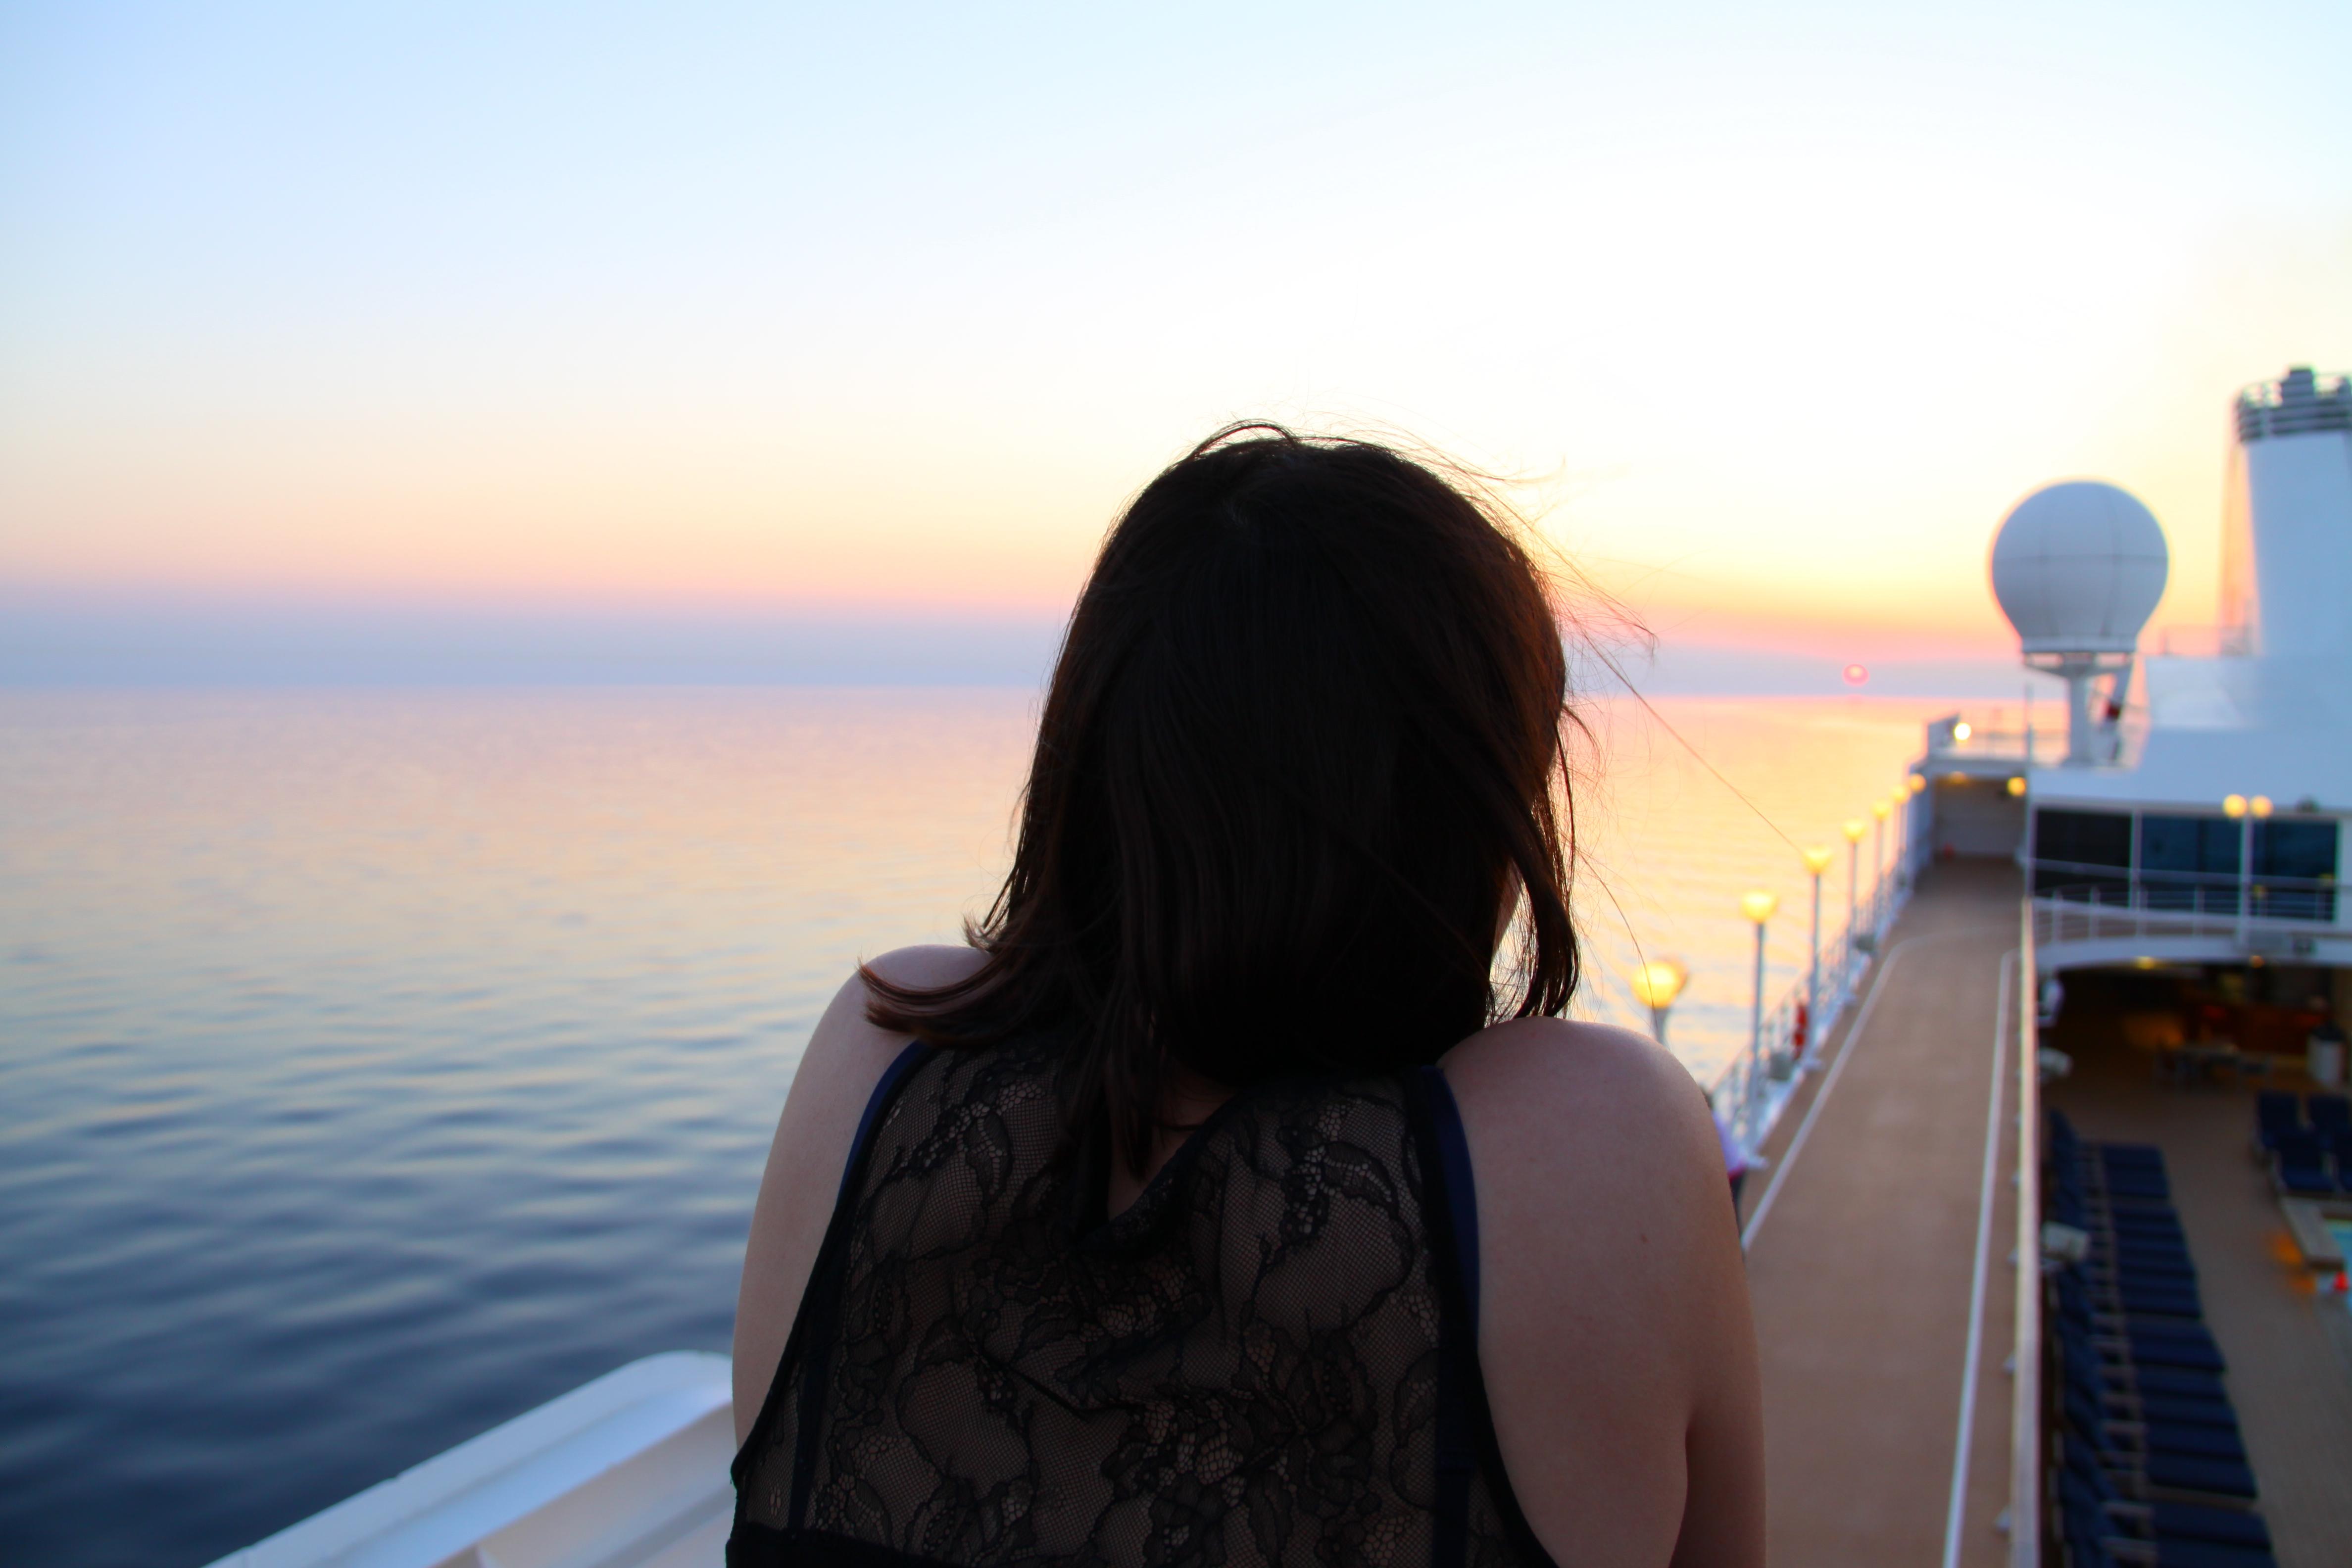 Mediterranean Sea (June, 2012)